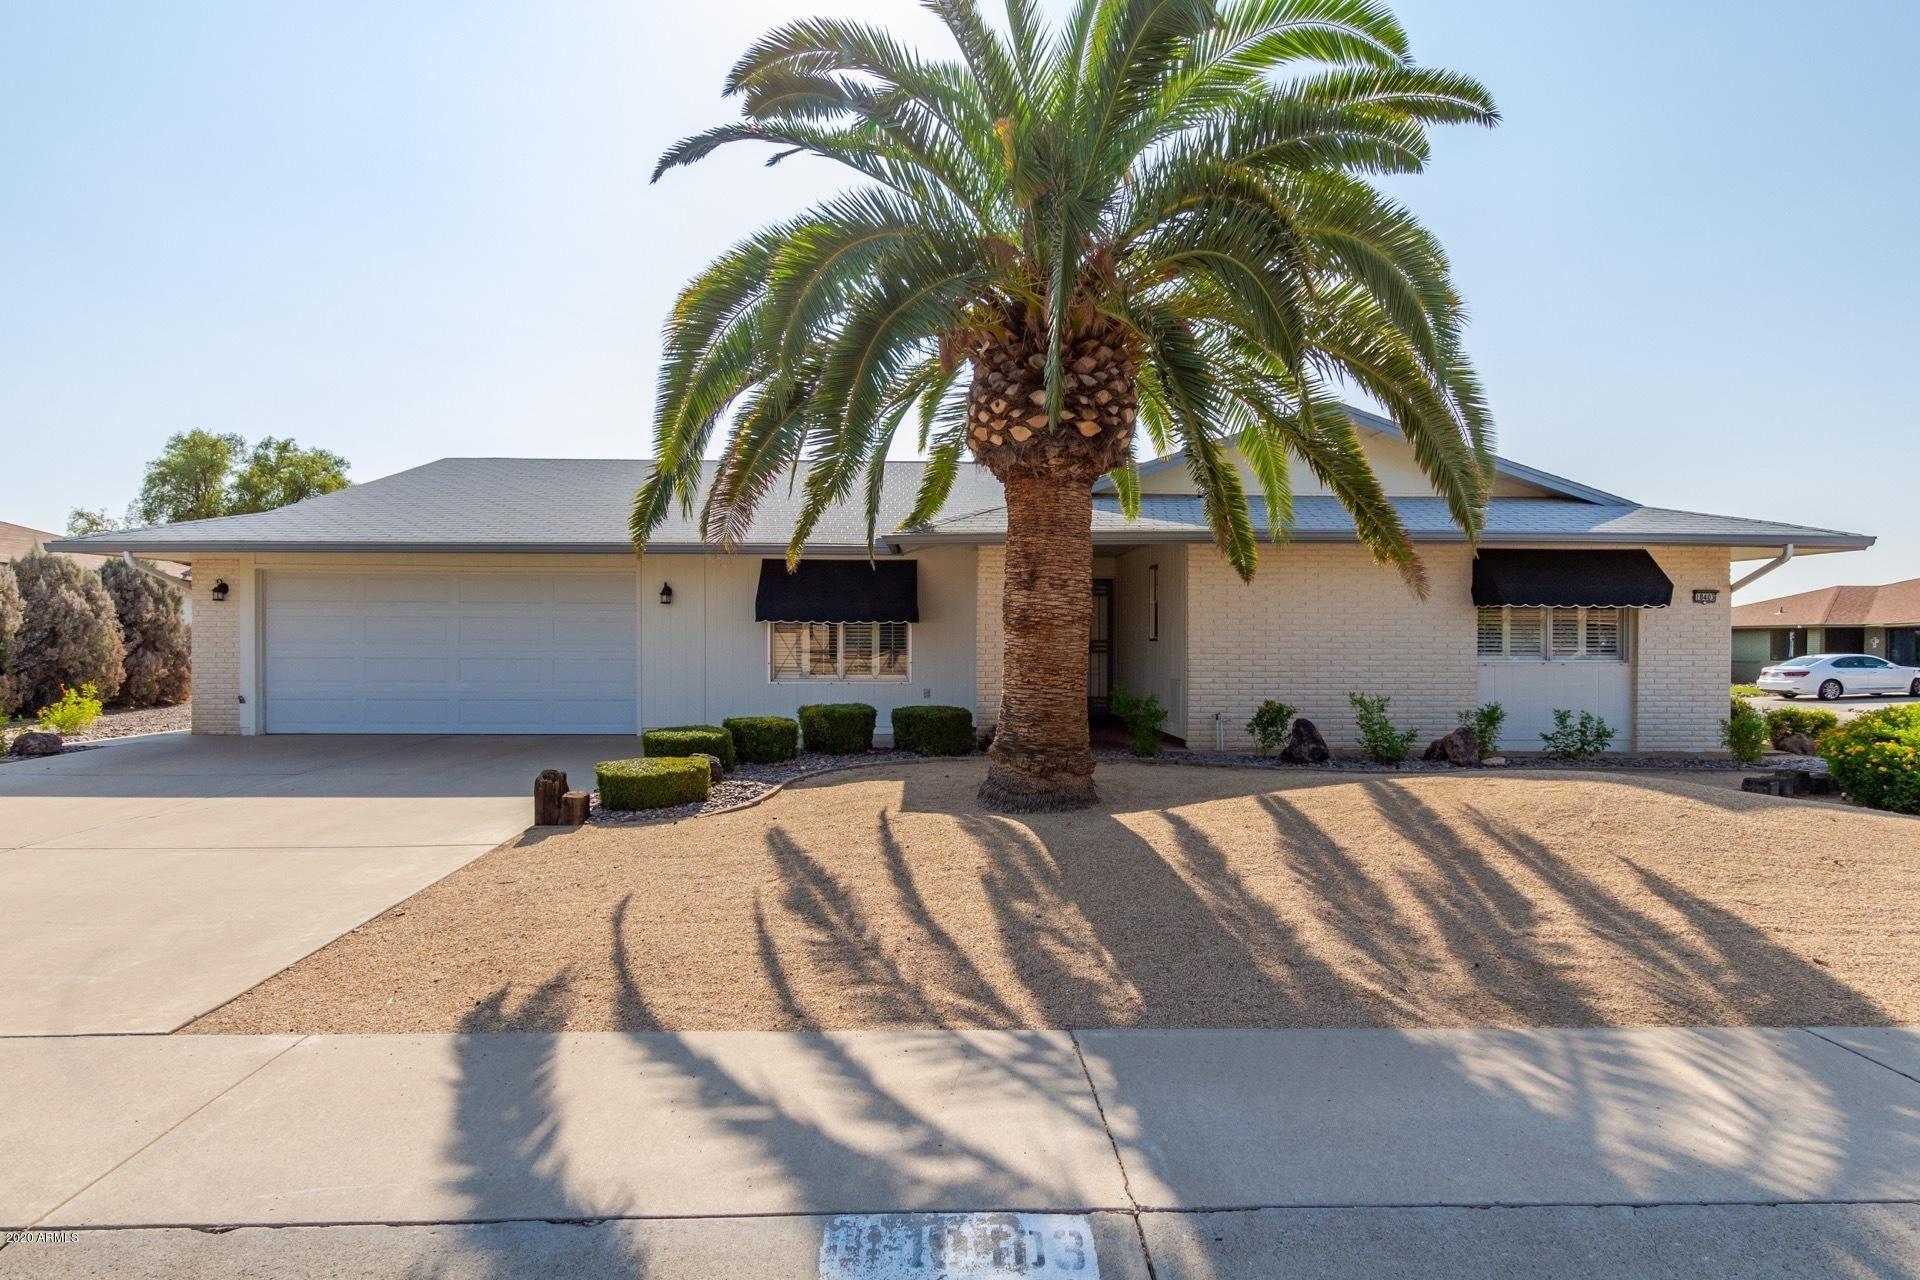 18403 N 94TH Avenue, Sun City, AZ 85373 - MLS#: 6132291